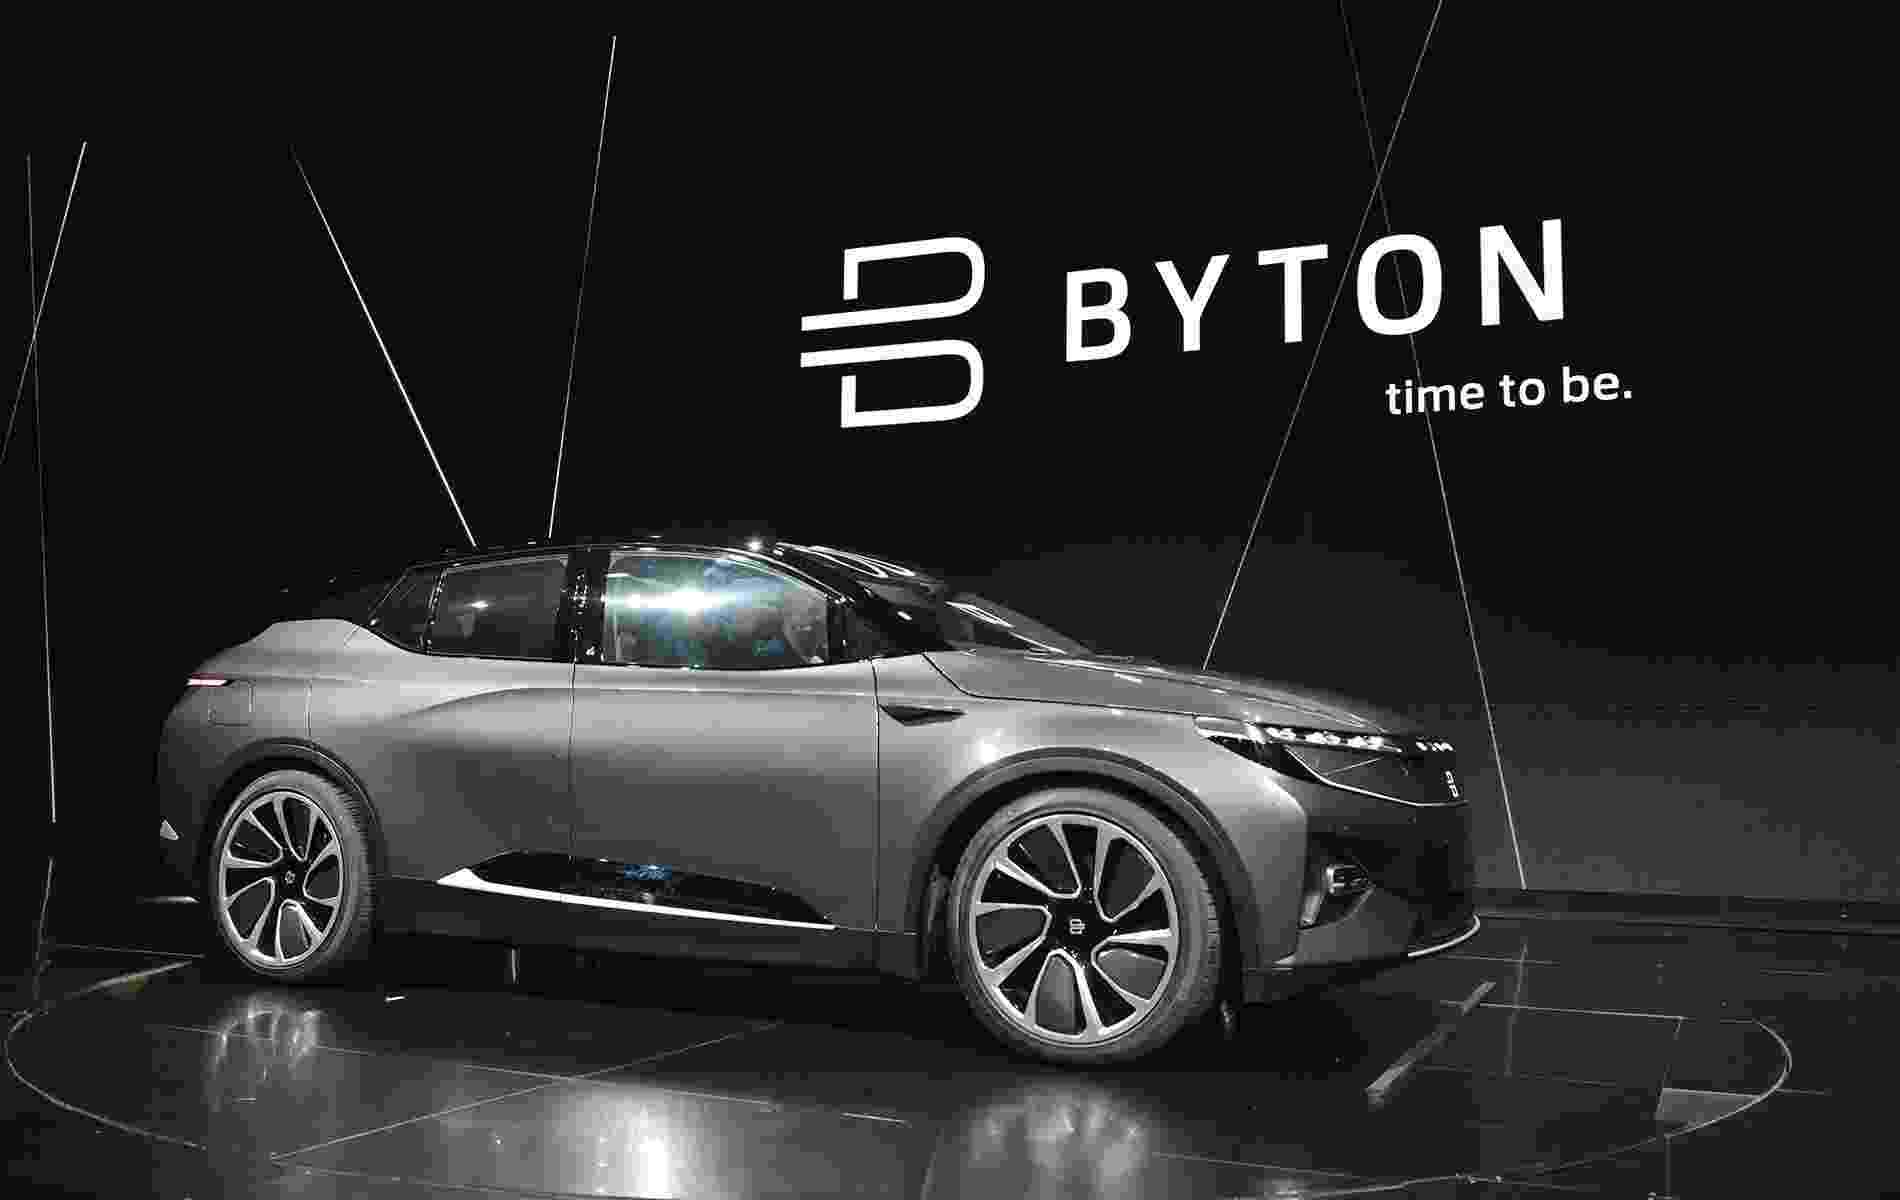 Byton Concept - MANDEL NGAN/AFP